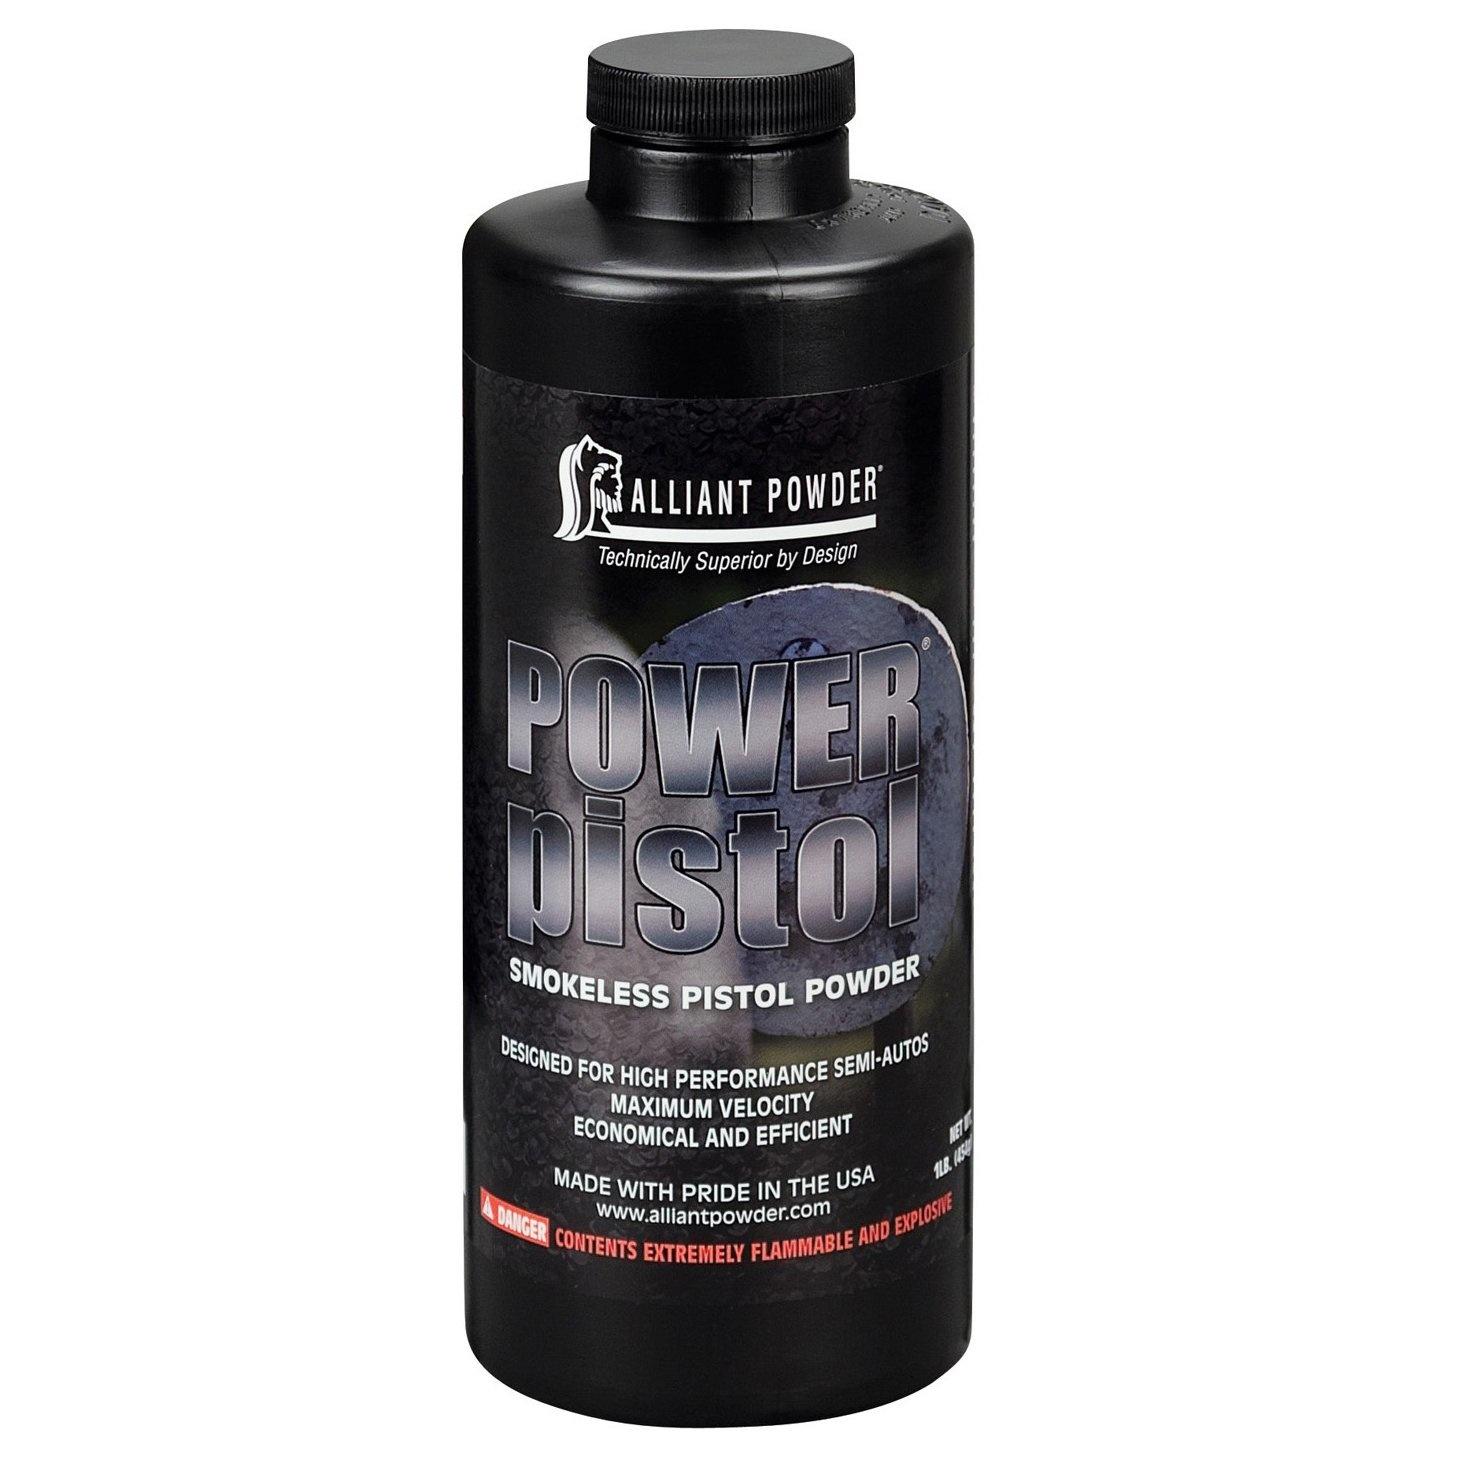 Alliant Powder 1lb Powder Pistol